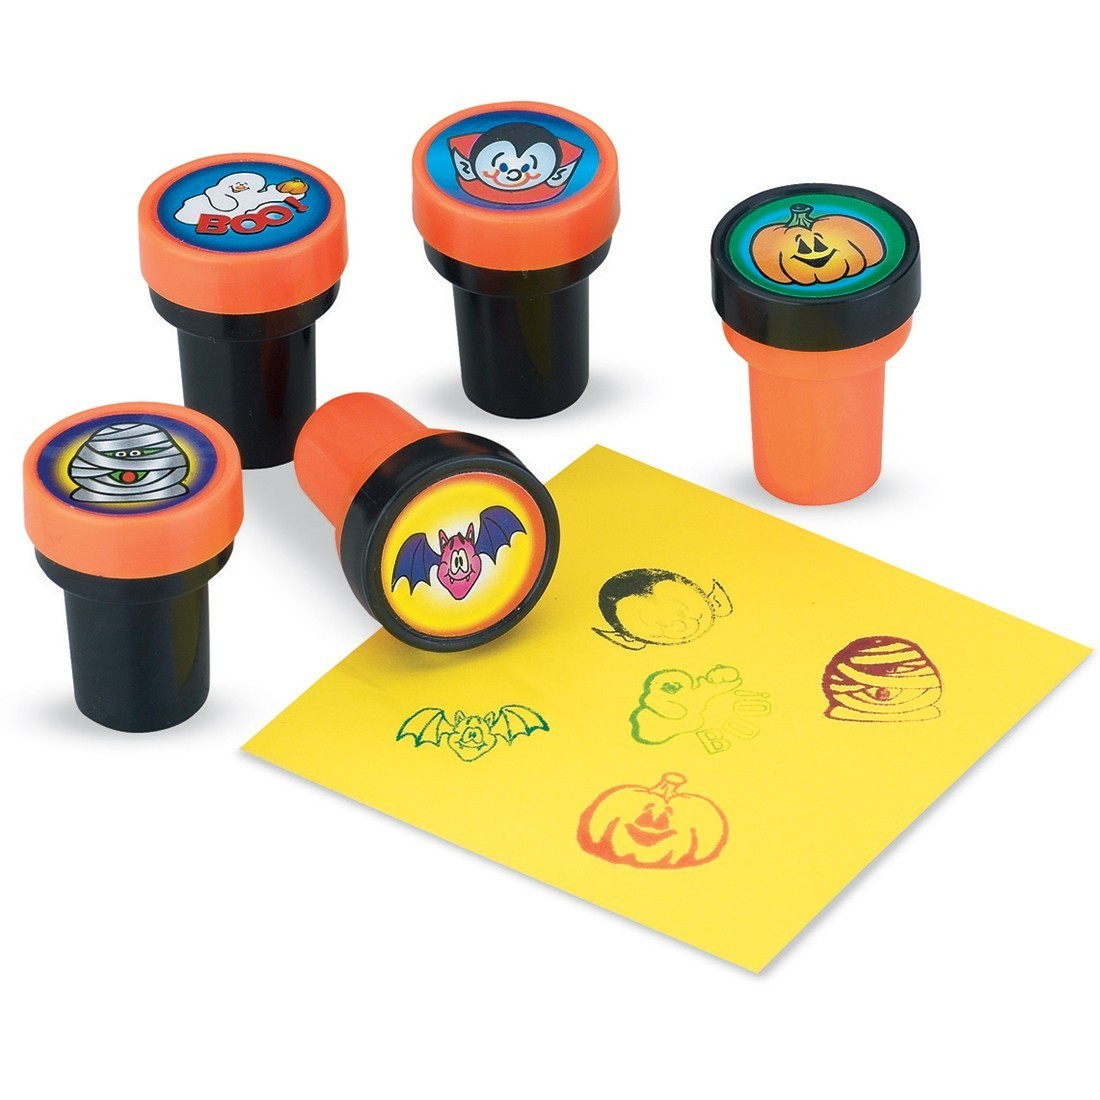 Halloween Stampers [image]